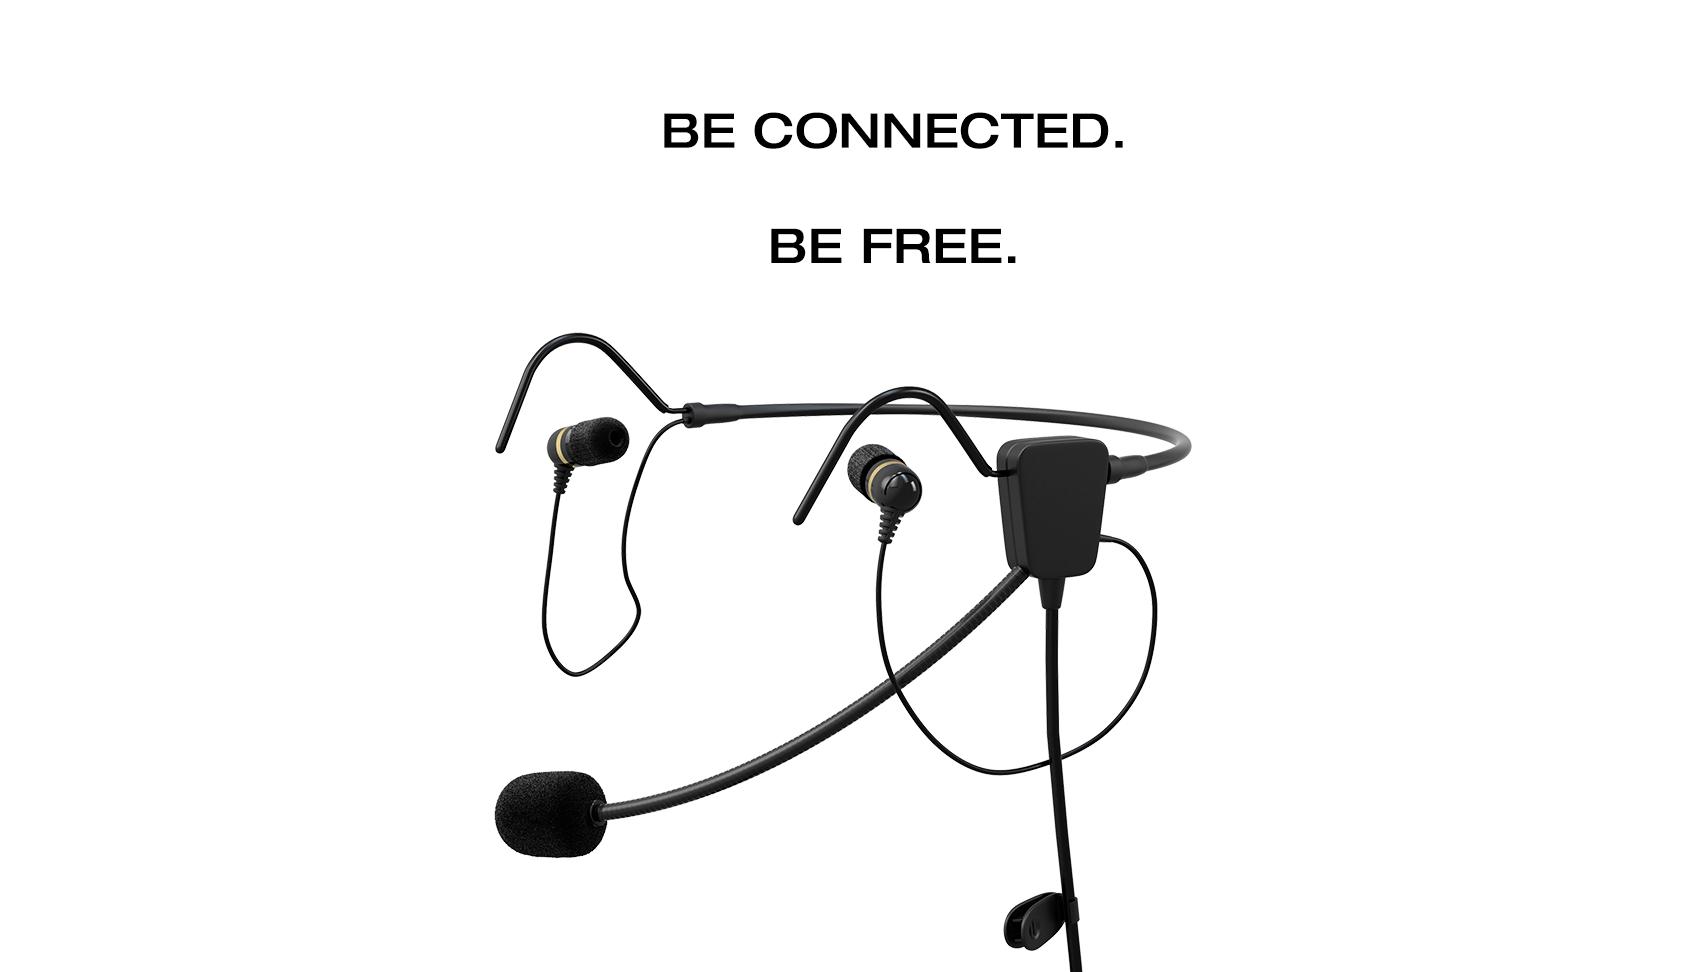 AIR In-Ear Headset